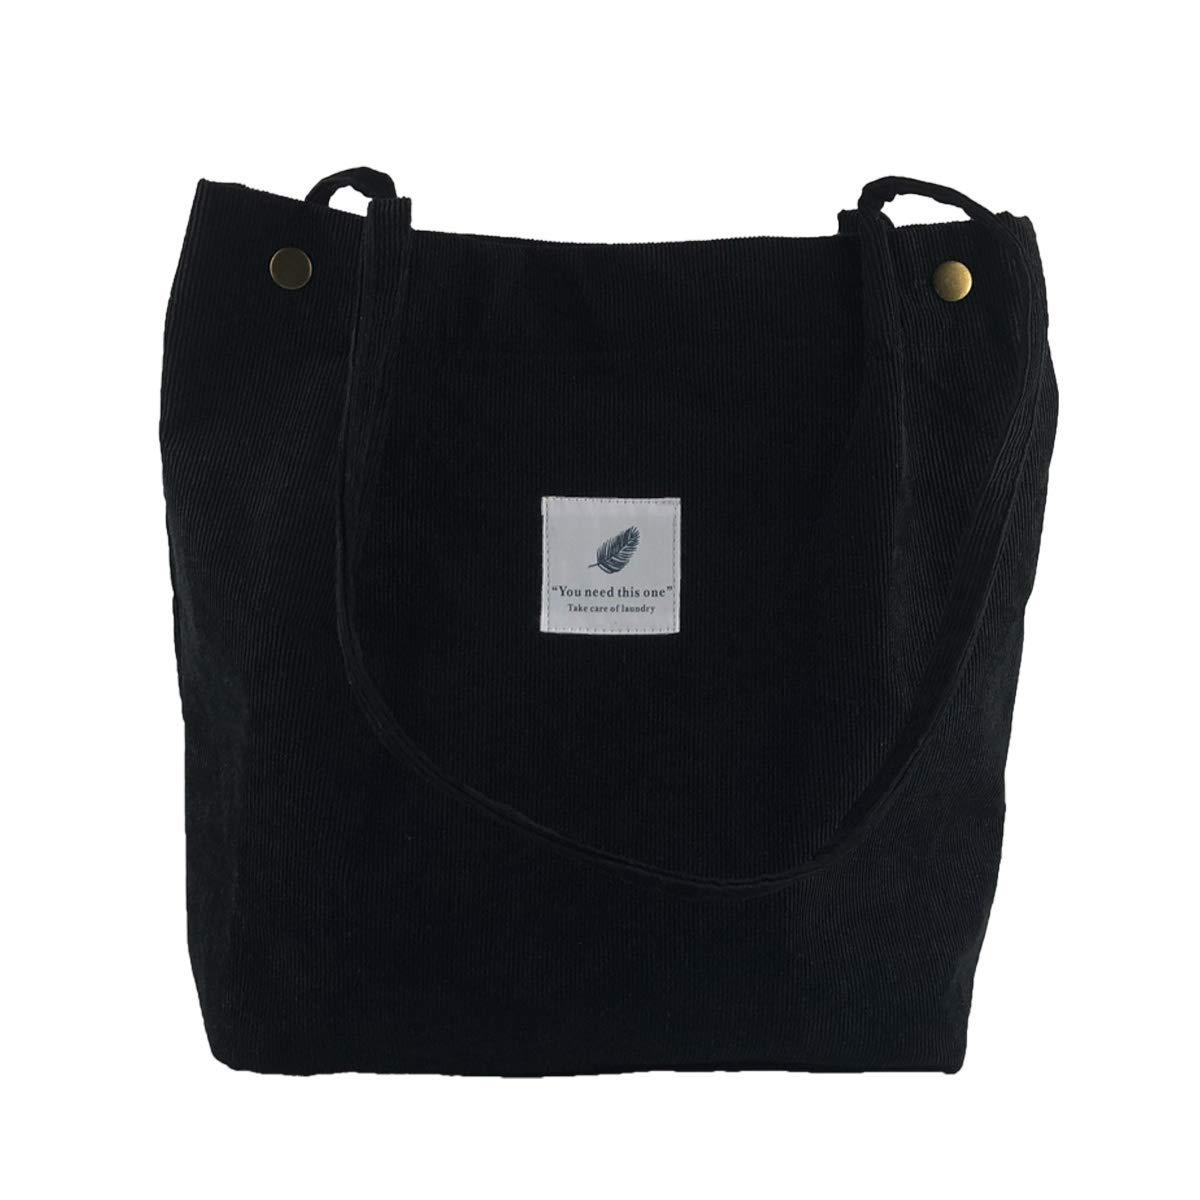 cabdb372fc57 Eflying Lion Corduroy Shoulder Bag Shopping Tote Bag Retro Casual  Handbags,Girls Bag,Ladies Shoulder Bag